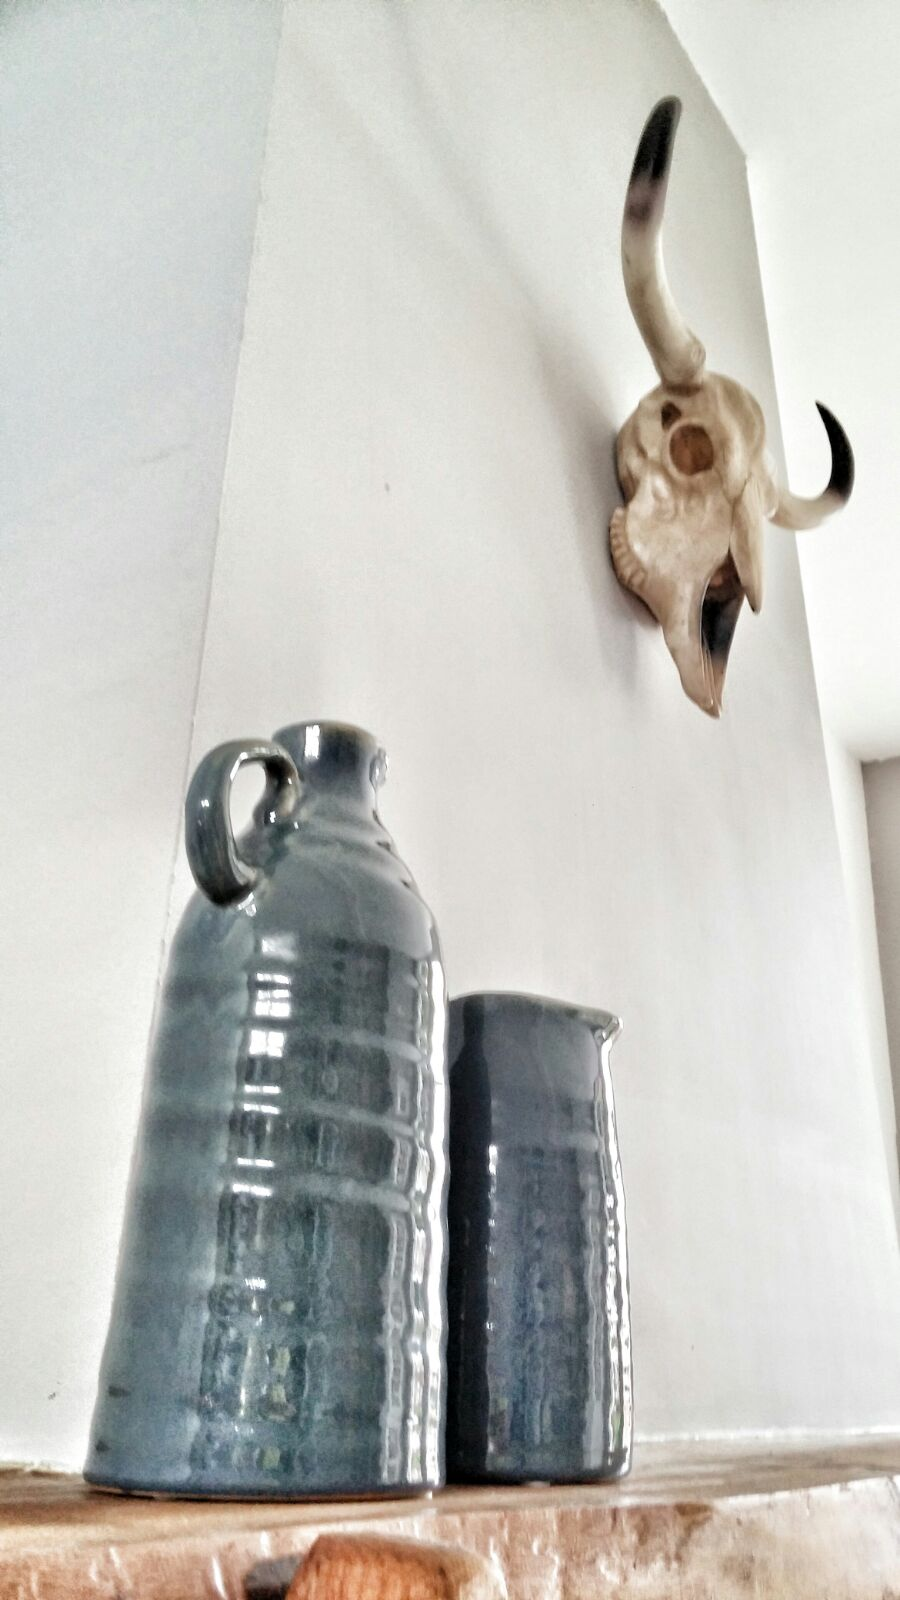 woonkamer interieurstyling industrieel stoer accessoires keramiek.jpg